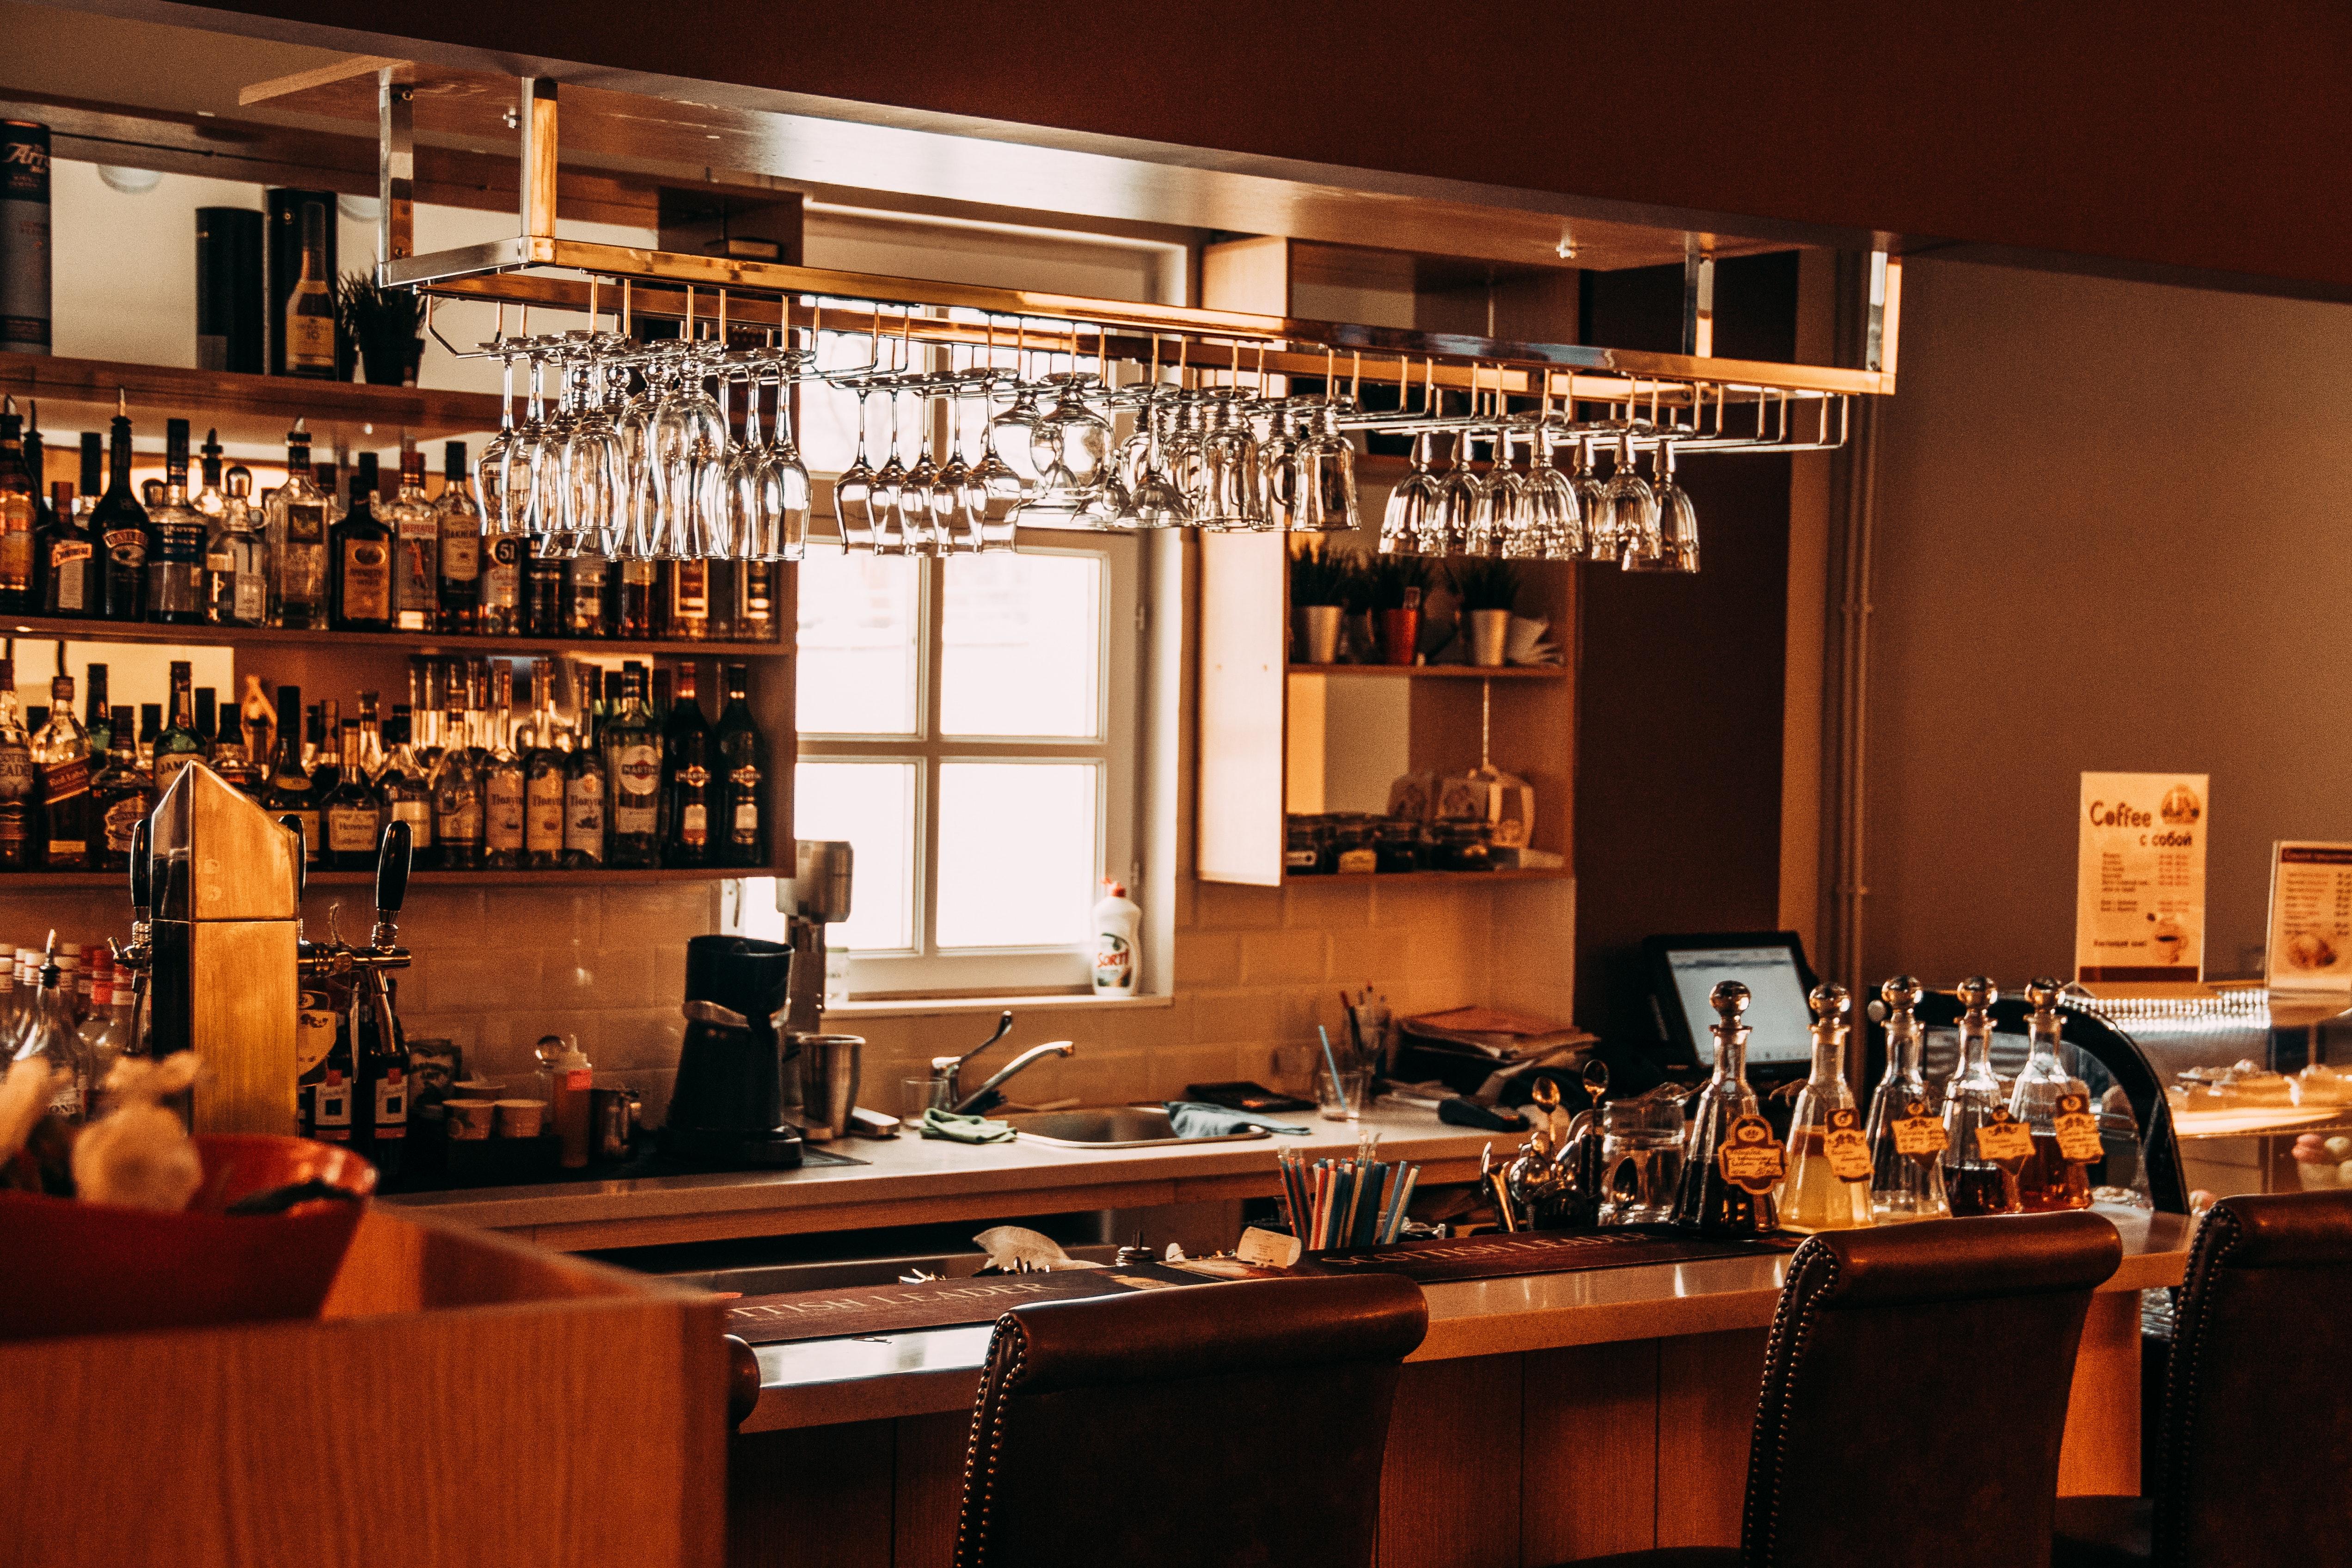 Interior of Modern Building, Kitchen, Wood, Wineglass, Wine, HQ Photo